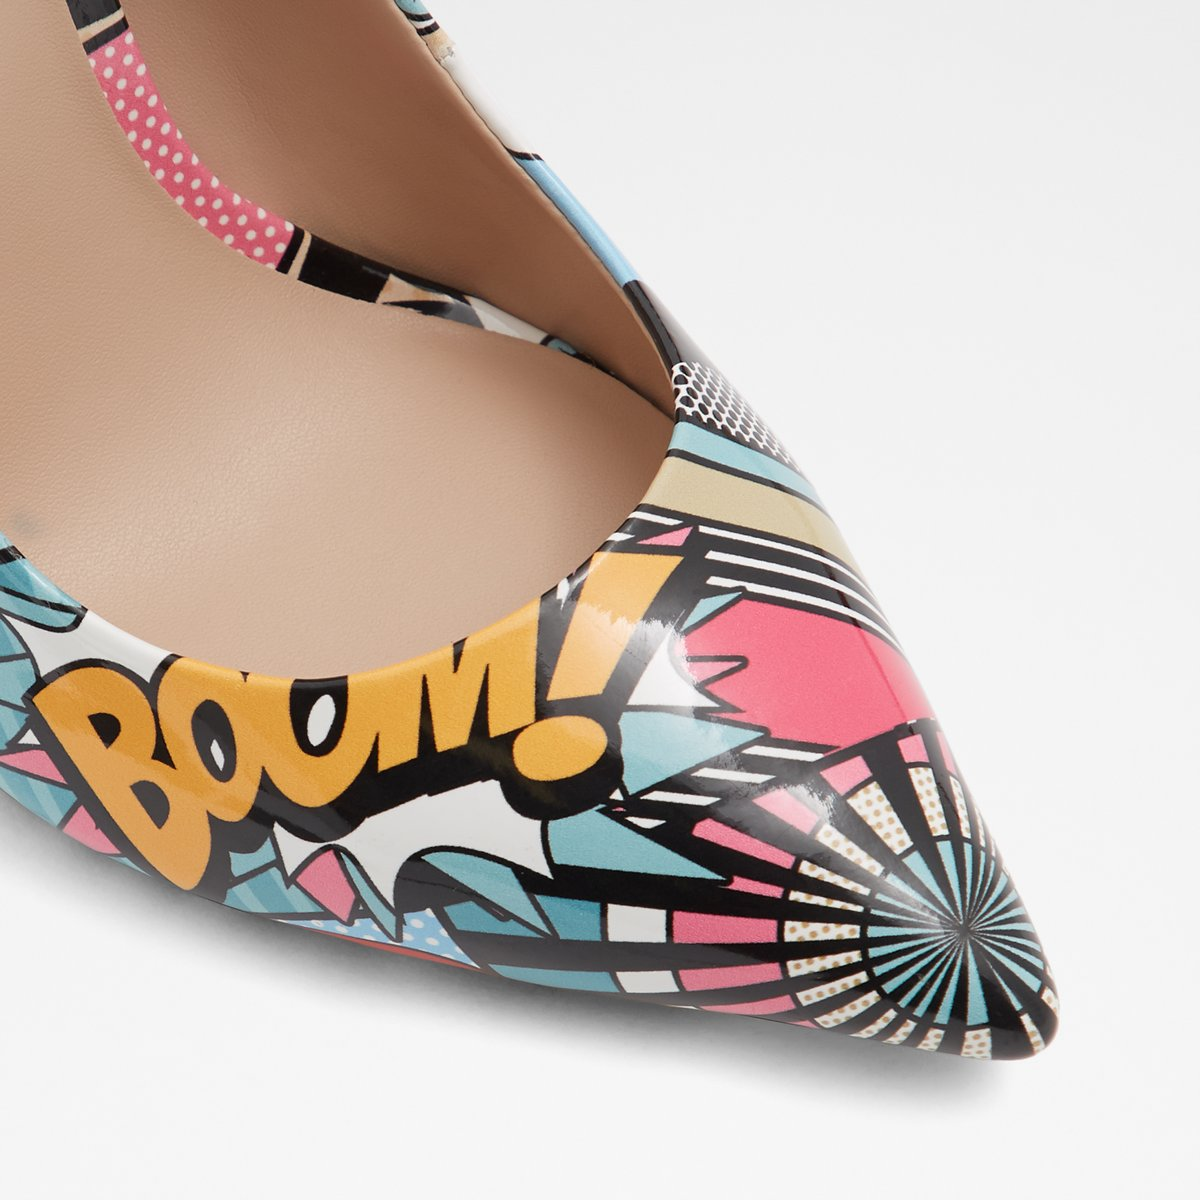 21b0663b7d96 Laralilla Black   White Women s Heels